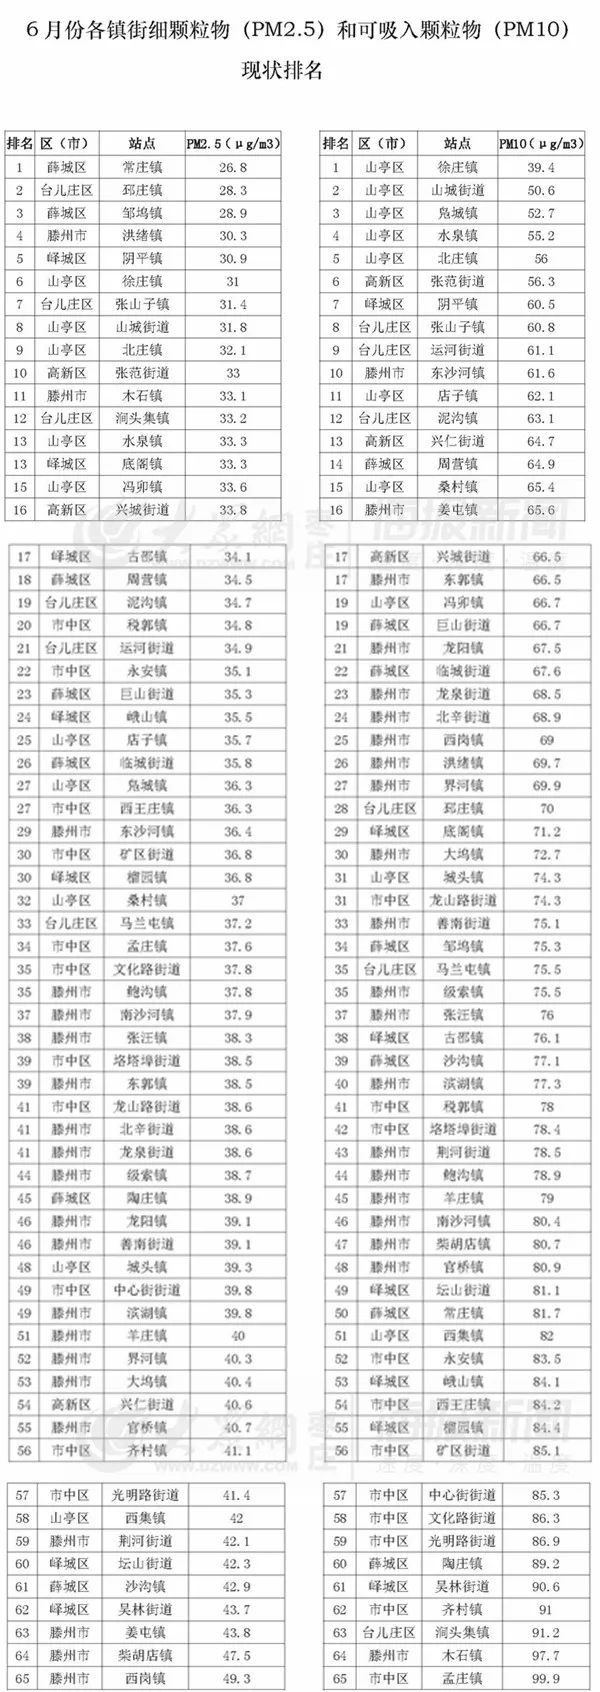 <b>枣庄发布65个镇街空气质量,看看排名!</b>